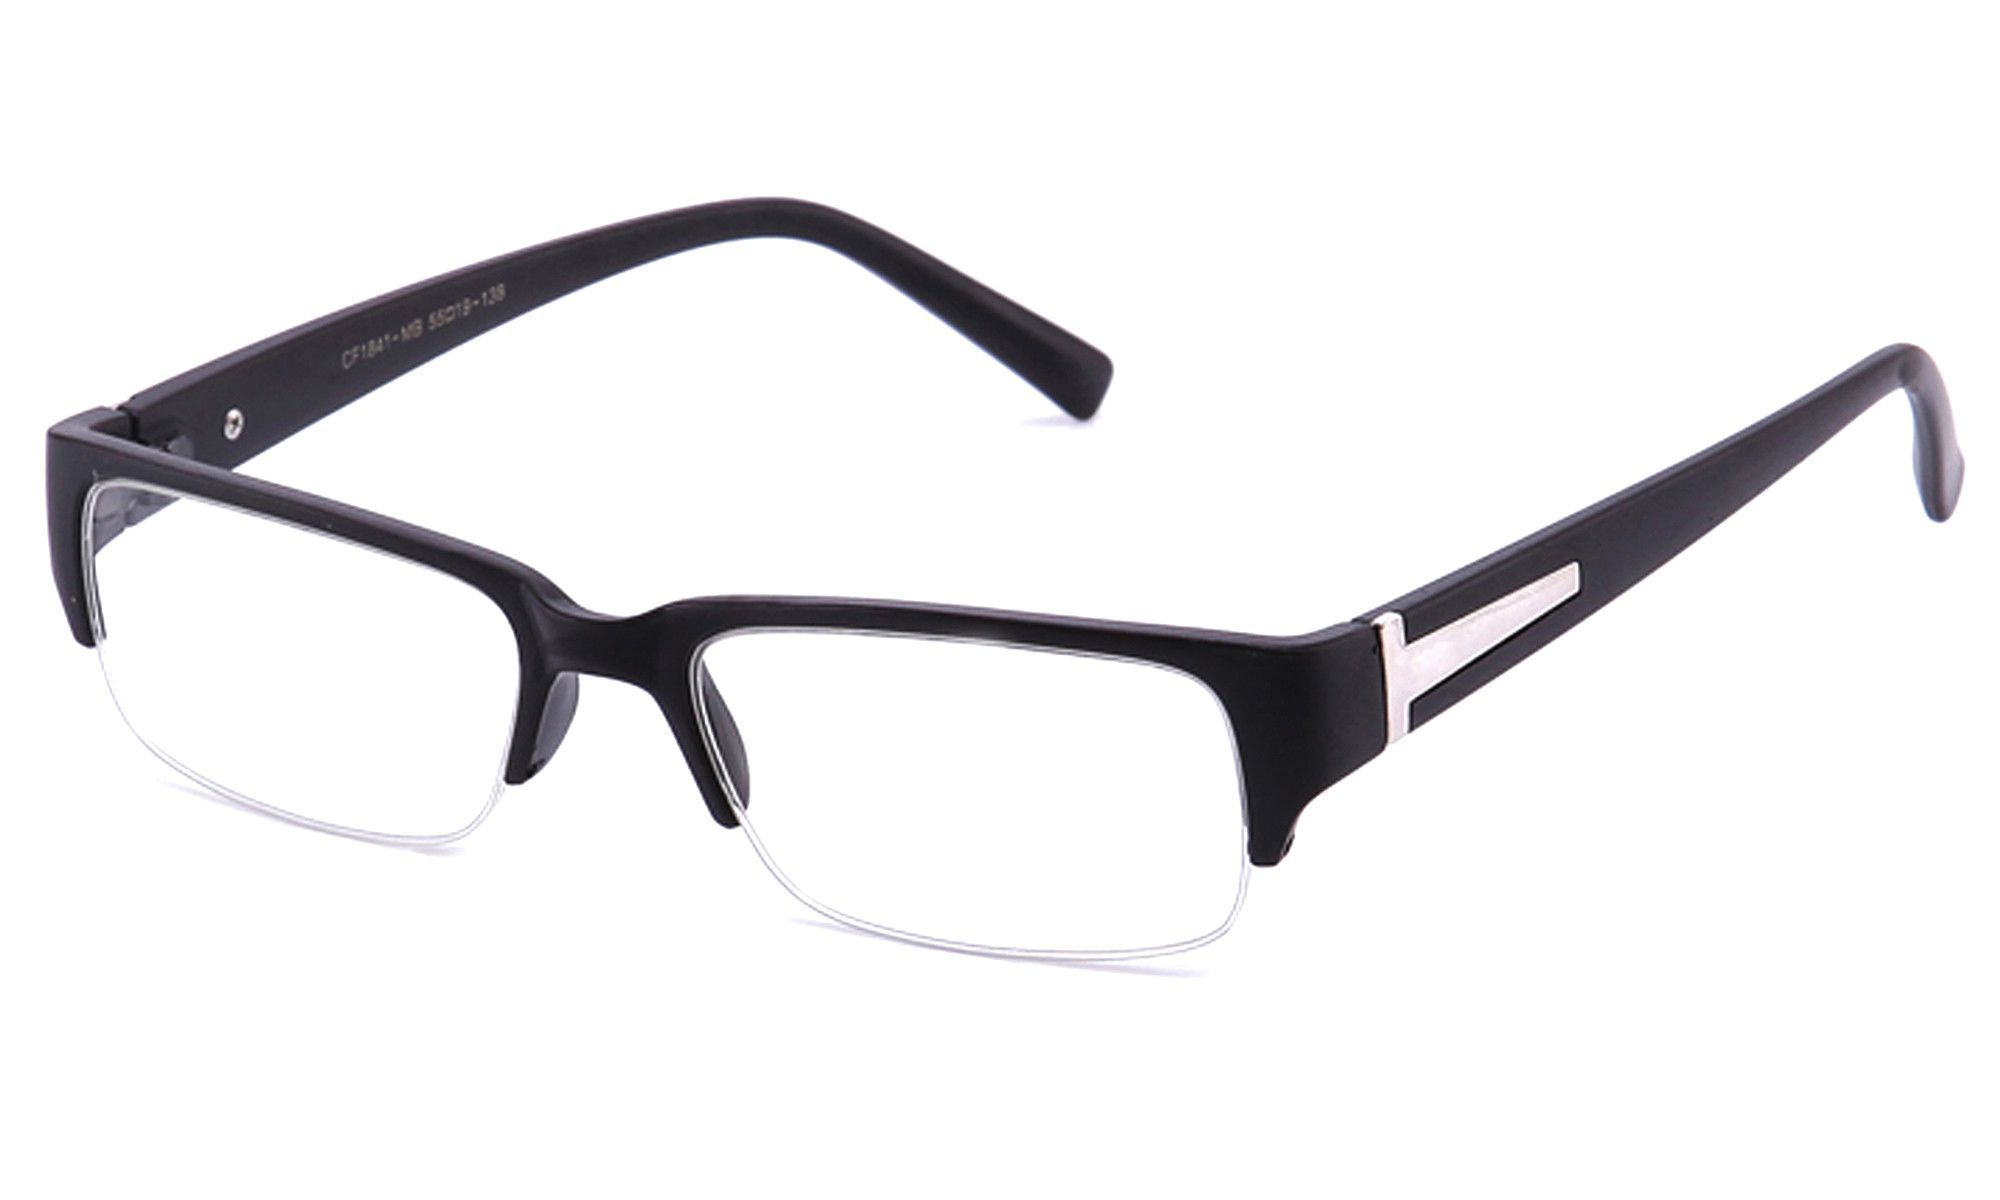 46096d491d Fashion Women. Eyewear. Moda Femenina. - Squared Design Half-Frame -  Material  Plastic - Gender  Unisex Adult -